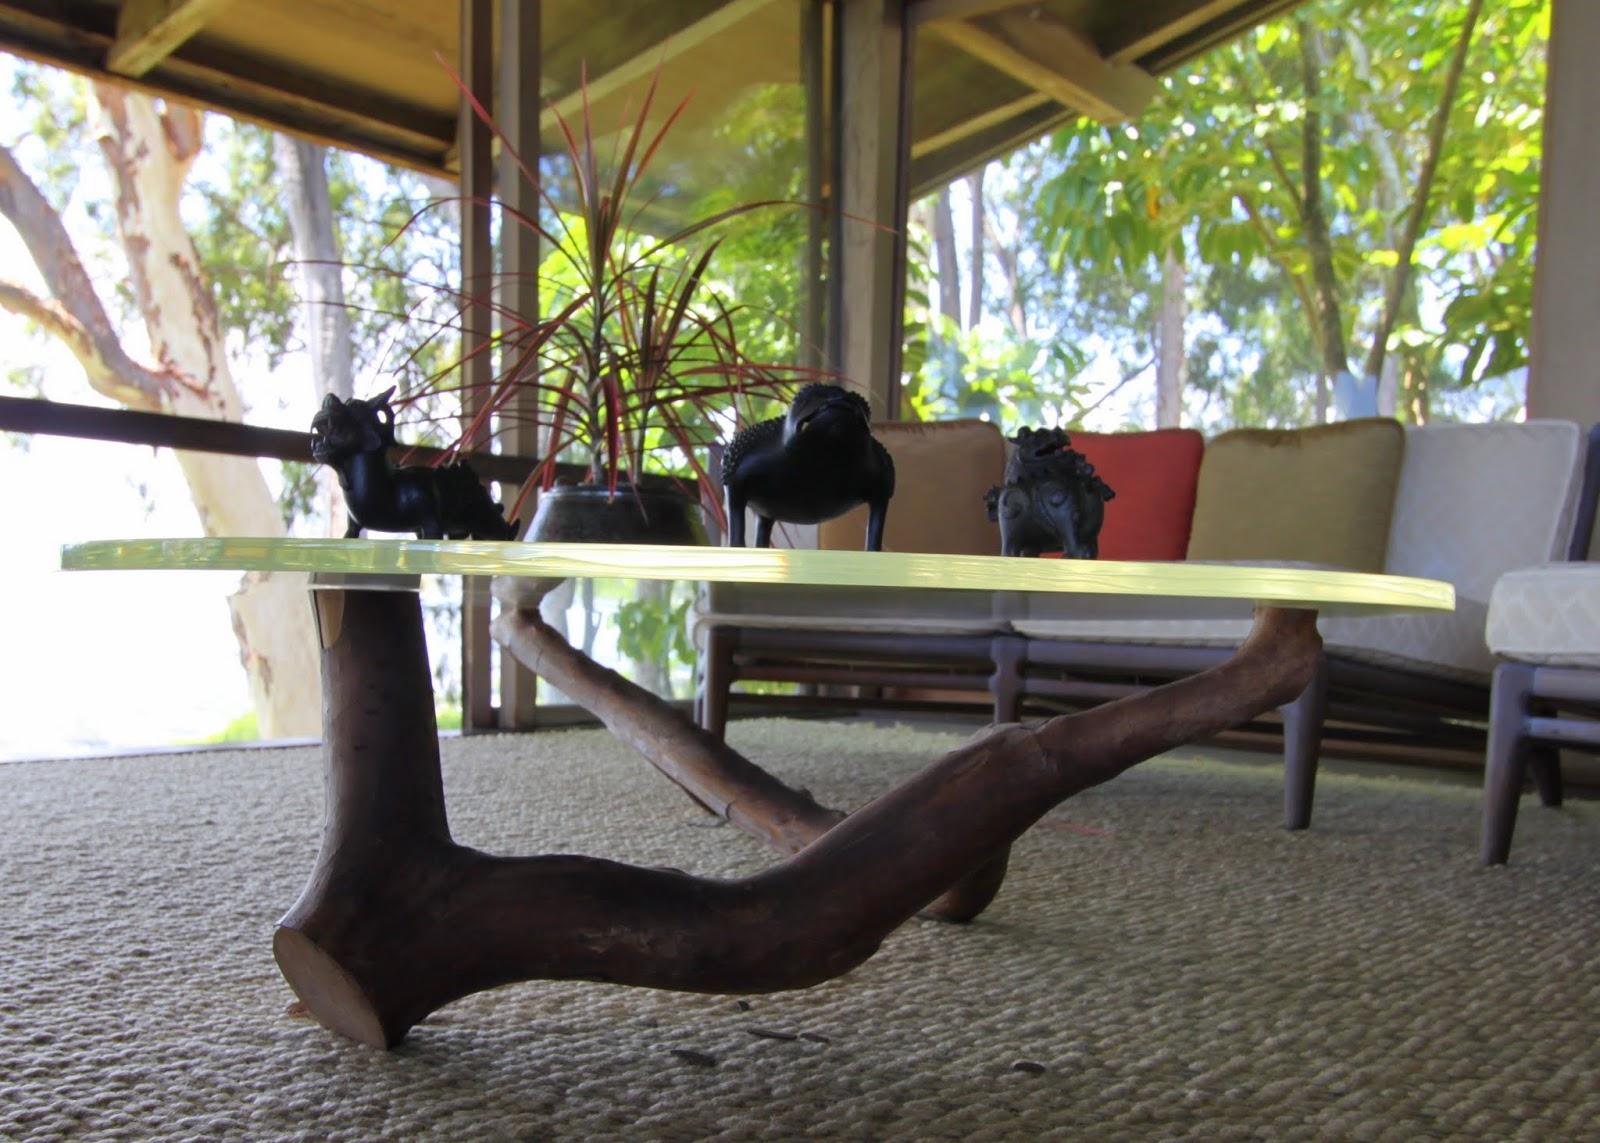 The liljestrand house ossipoff tantalus dirve honolulu hawaii